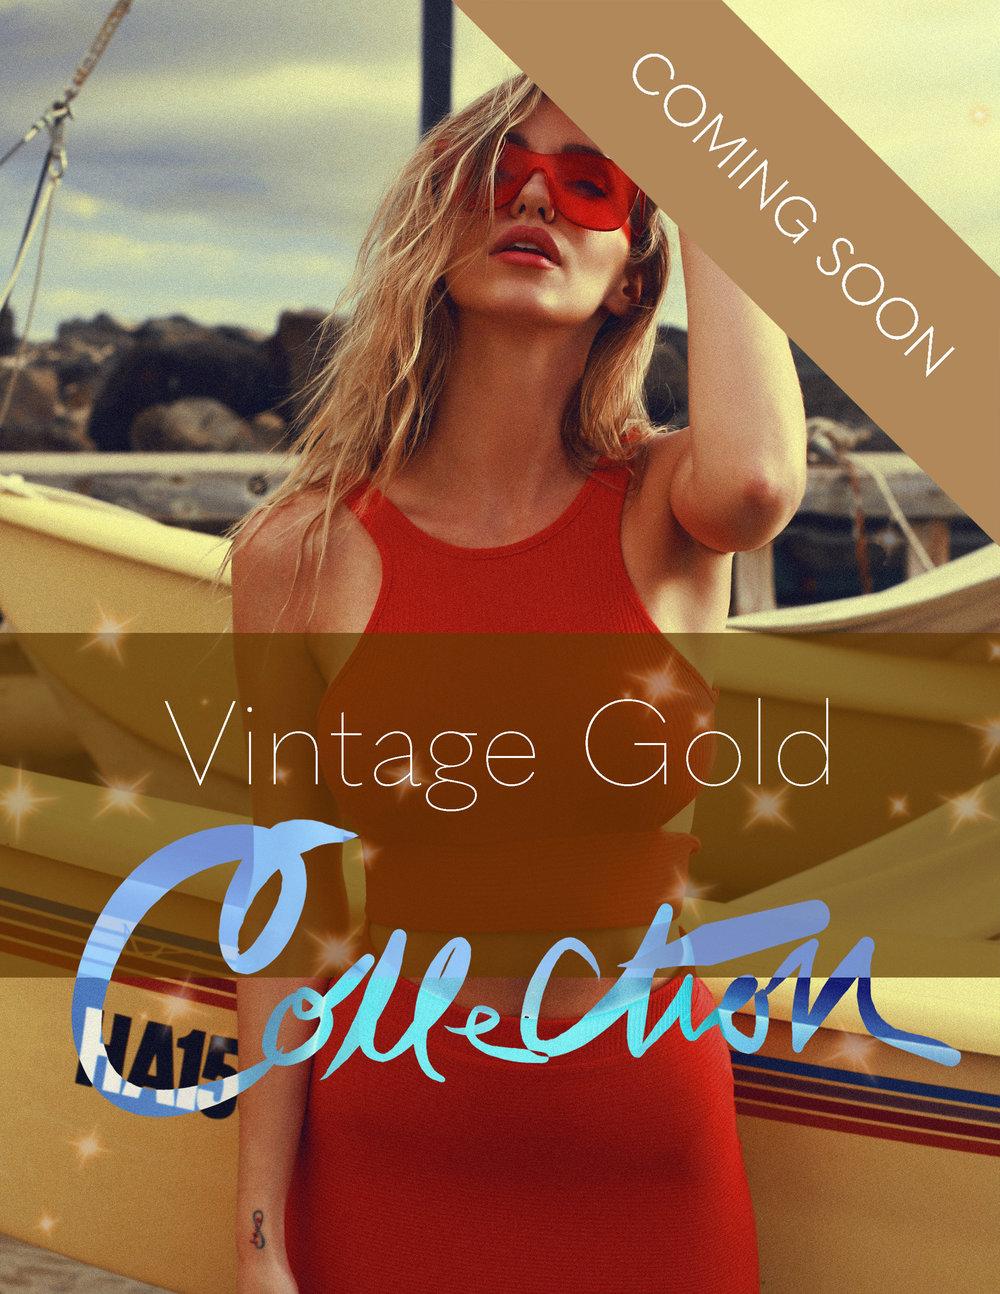 Vintage Gold Collection Photoshop Actions - SHOP Photographer Alyssa Risley @alyssarisley